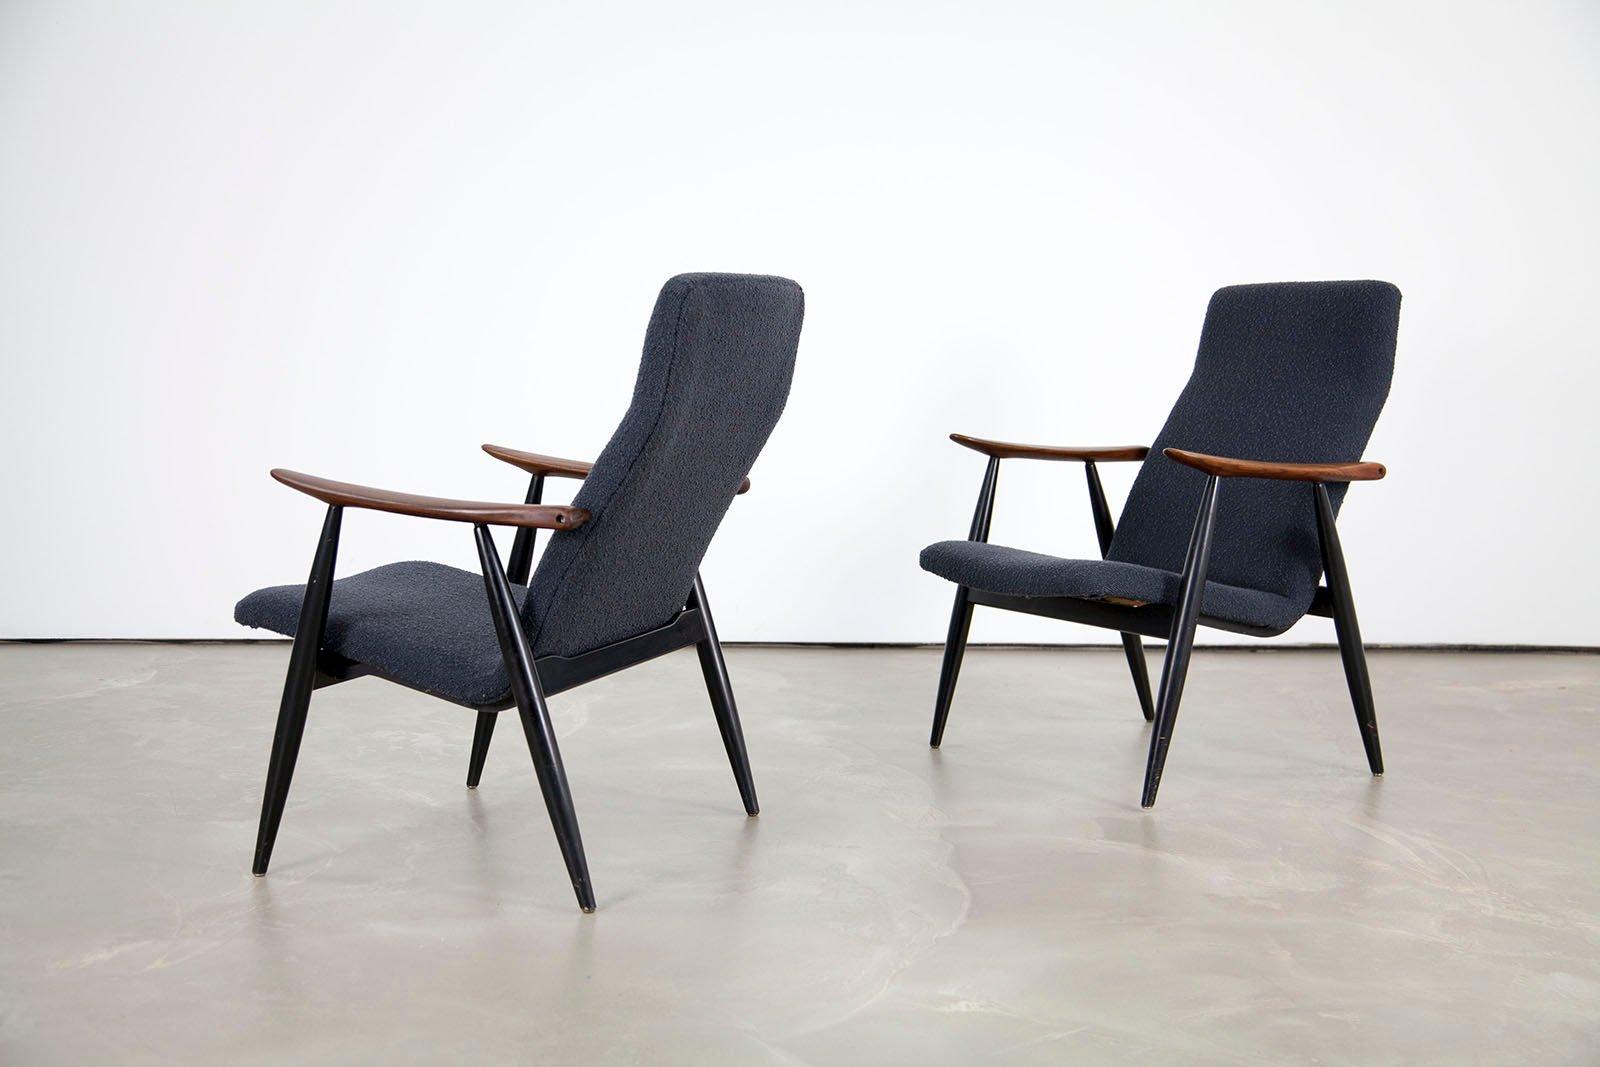 Vintage Scandinavian Teak Lounge Chair By Olli Borg For Asko